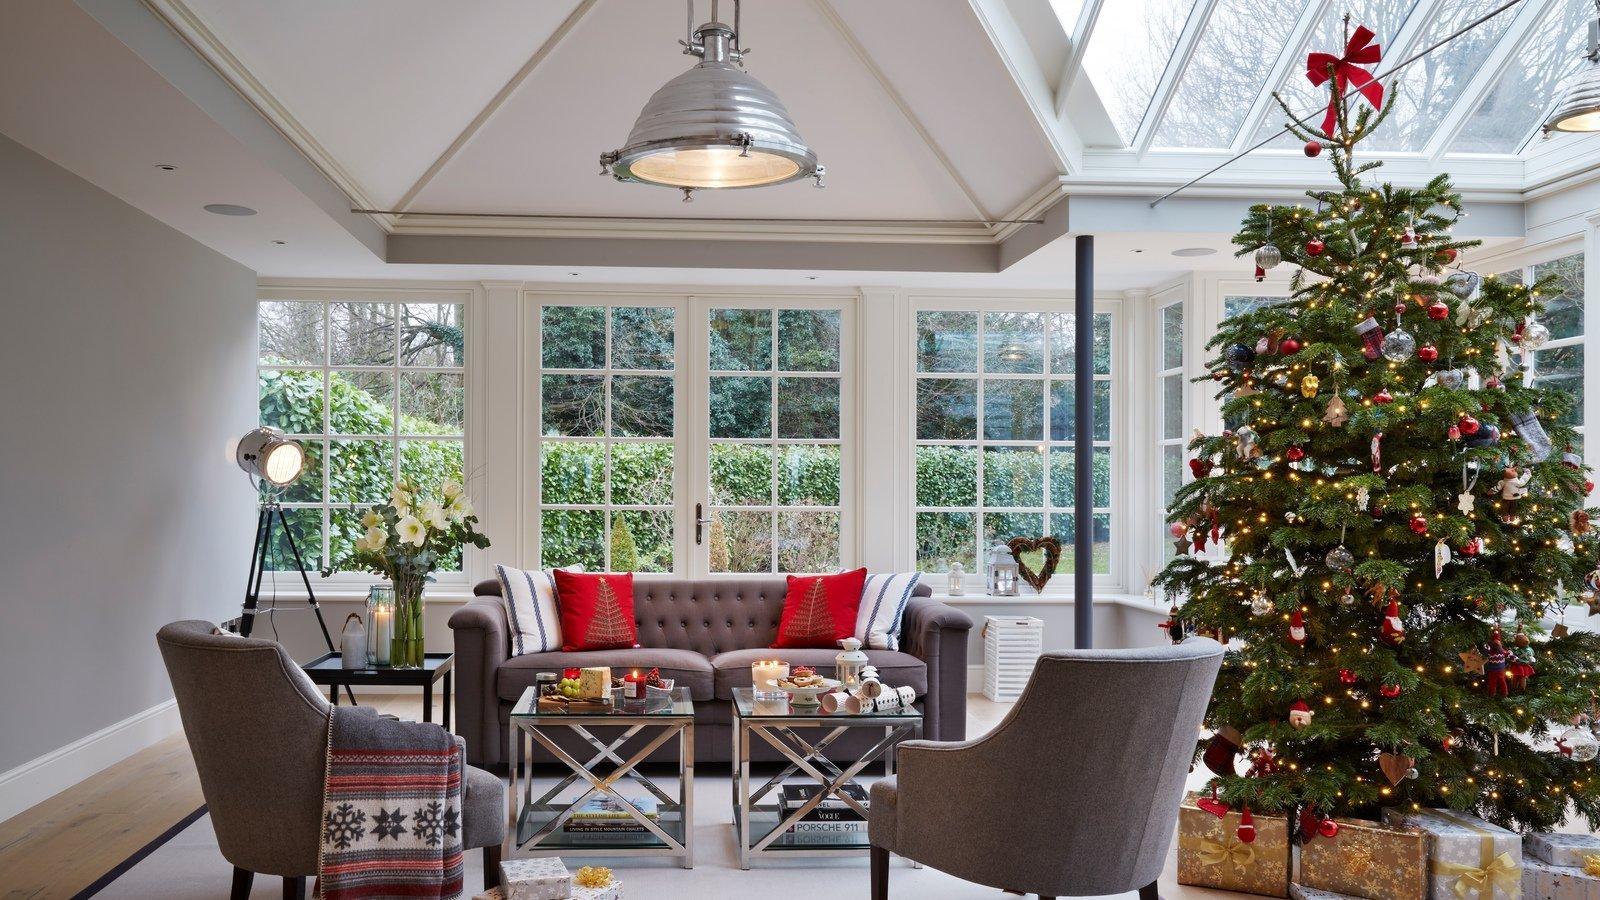 Garden Room Decorated for the Festive Season